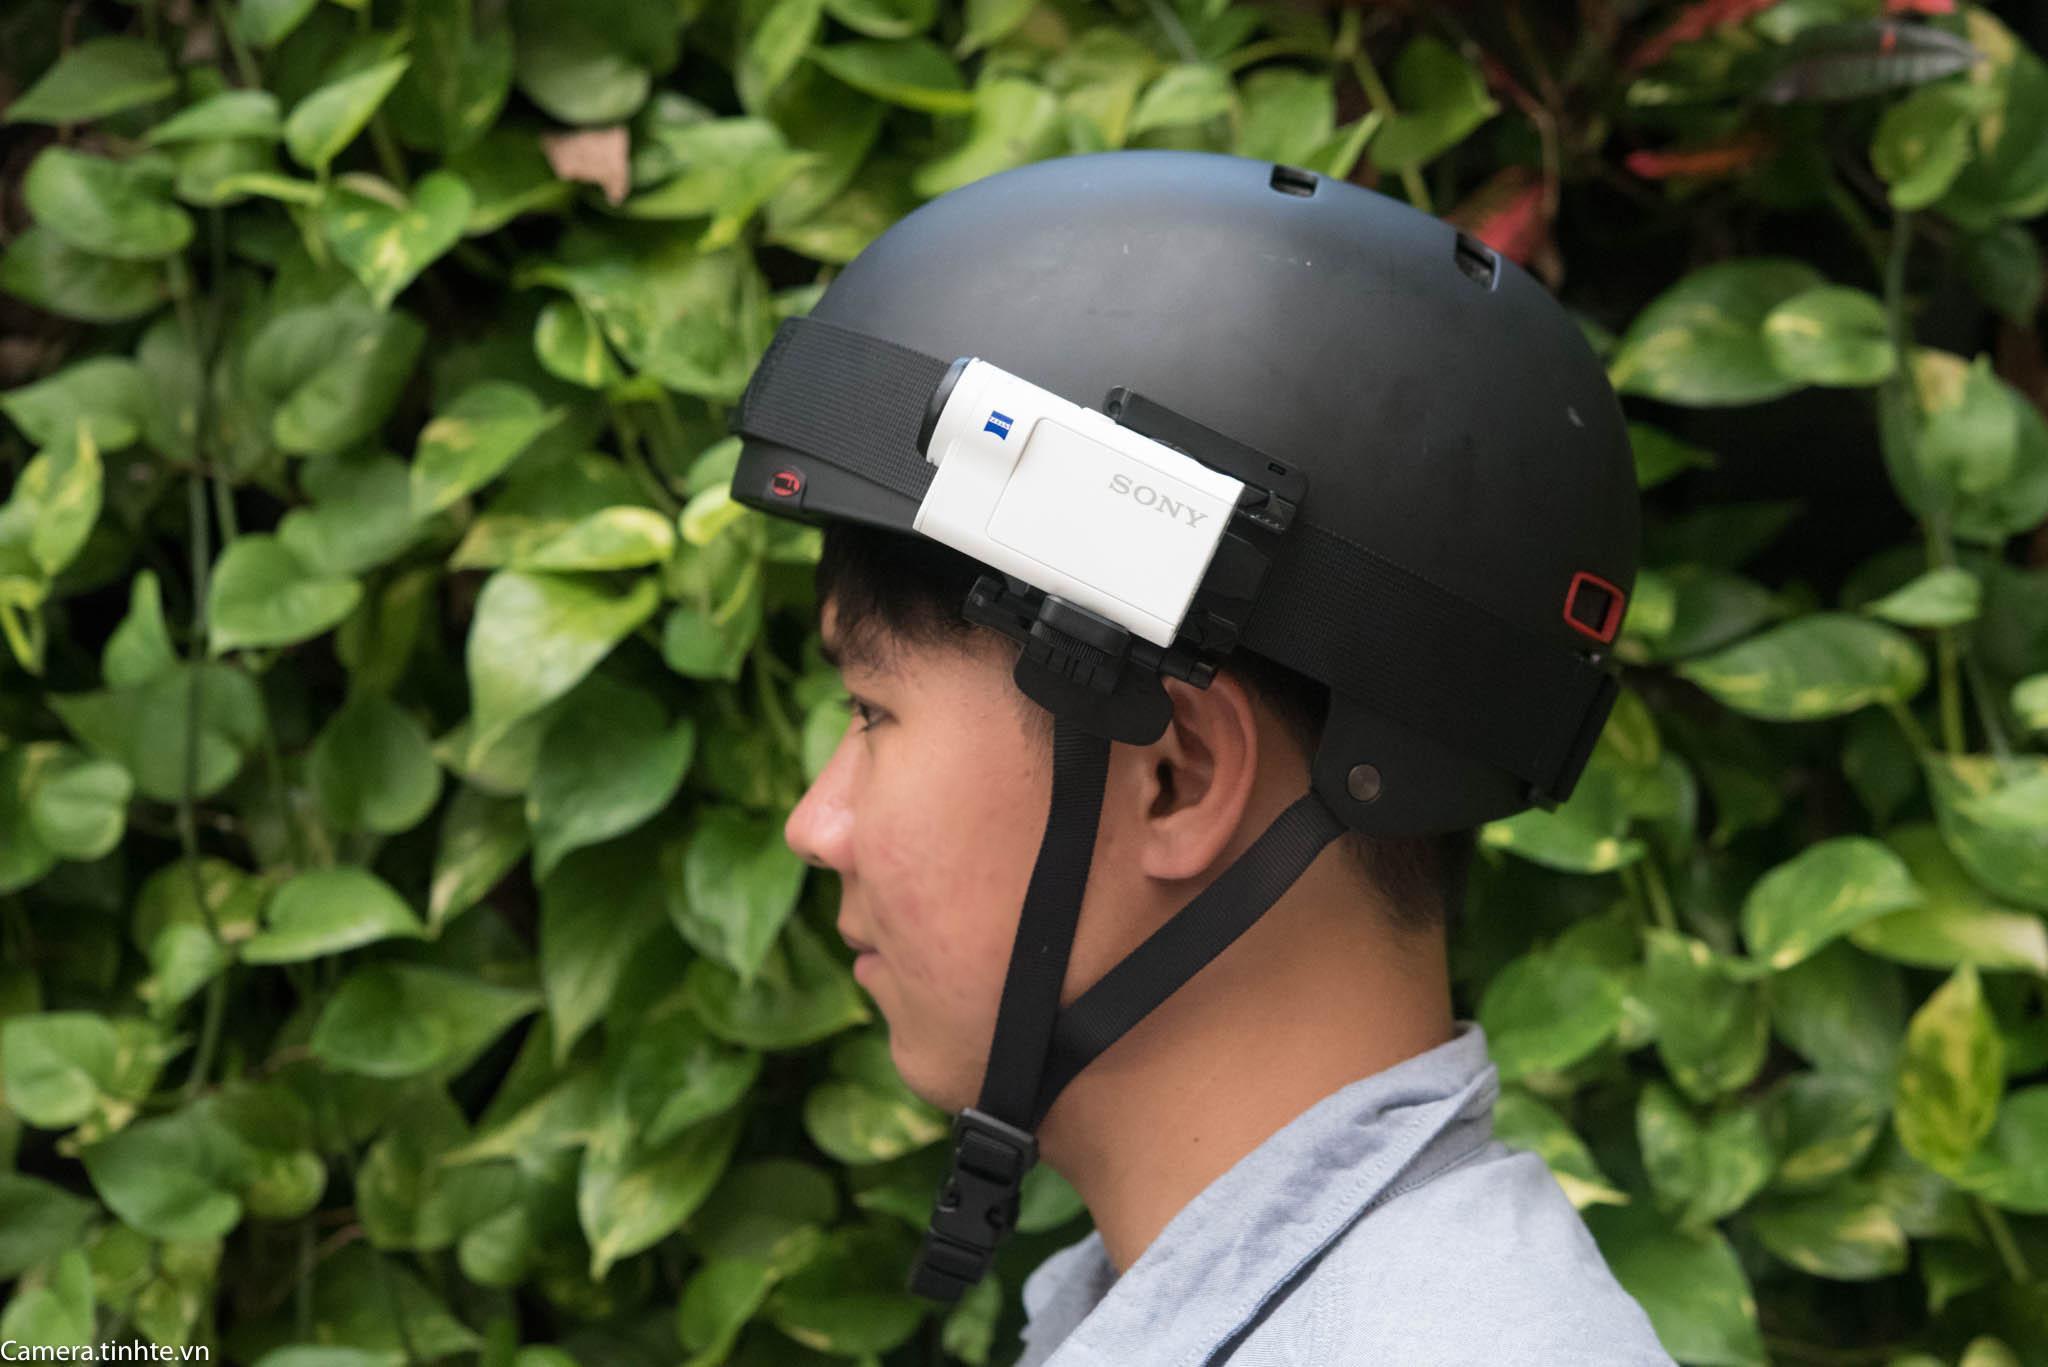 Phu kien Sony FDR-X3000 - Camera.tinhte.vn -6.jpg